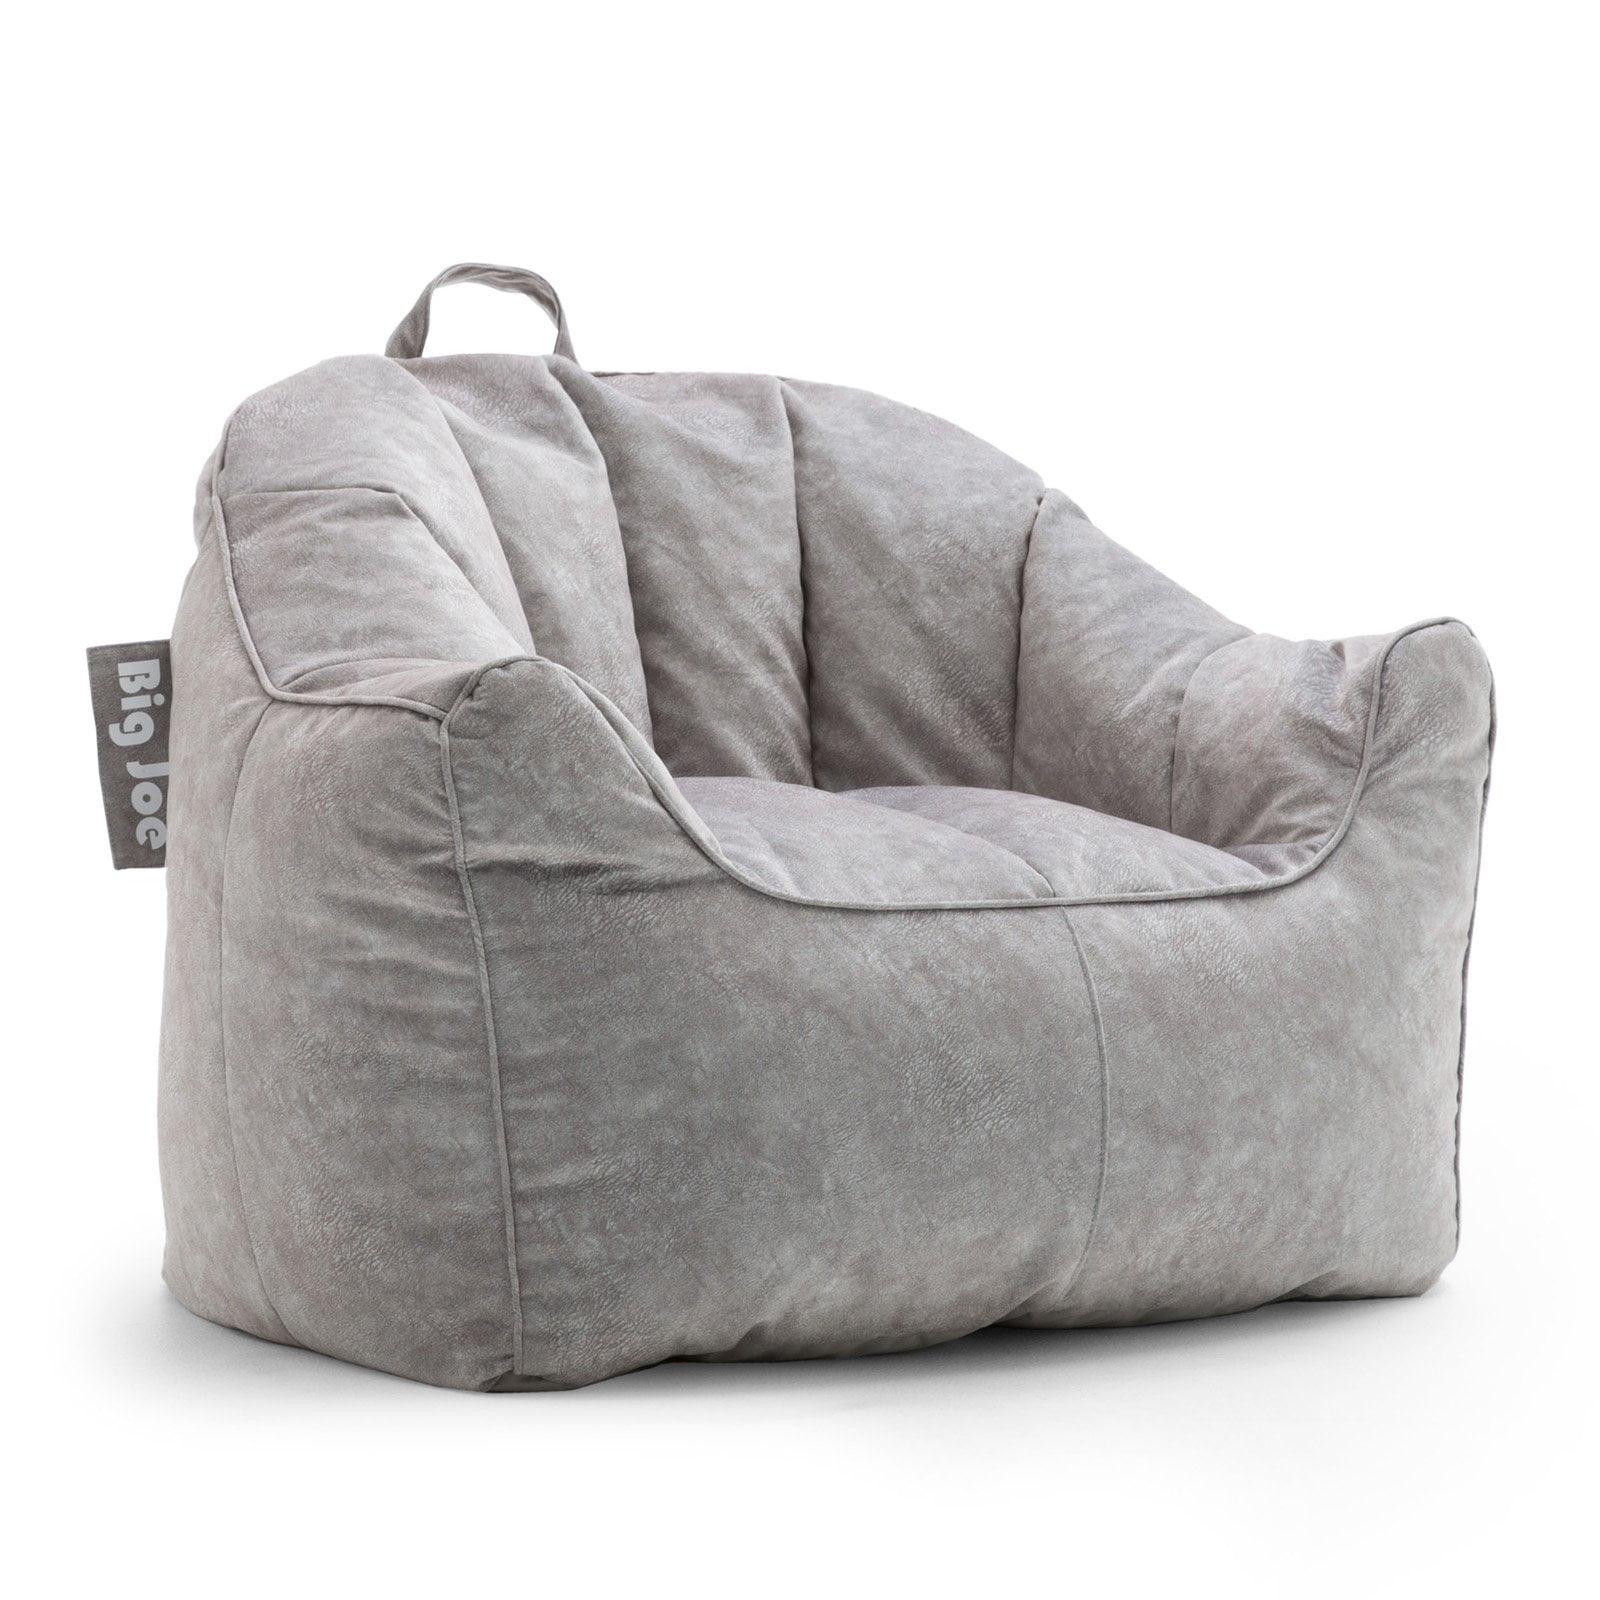 Big Joe Hug Bean Bag Chair